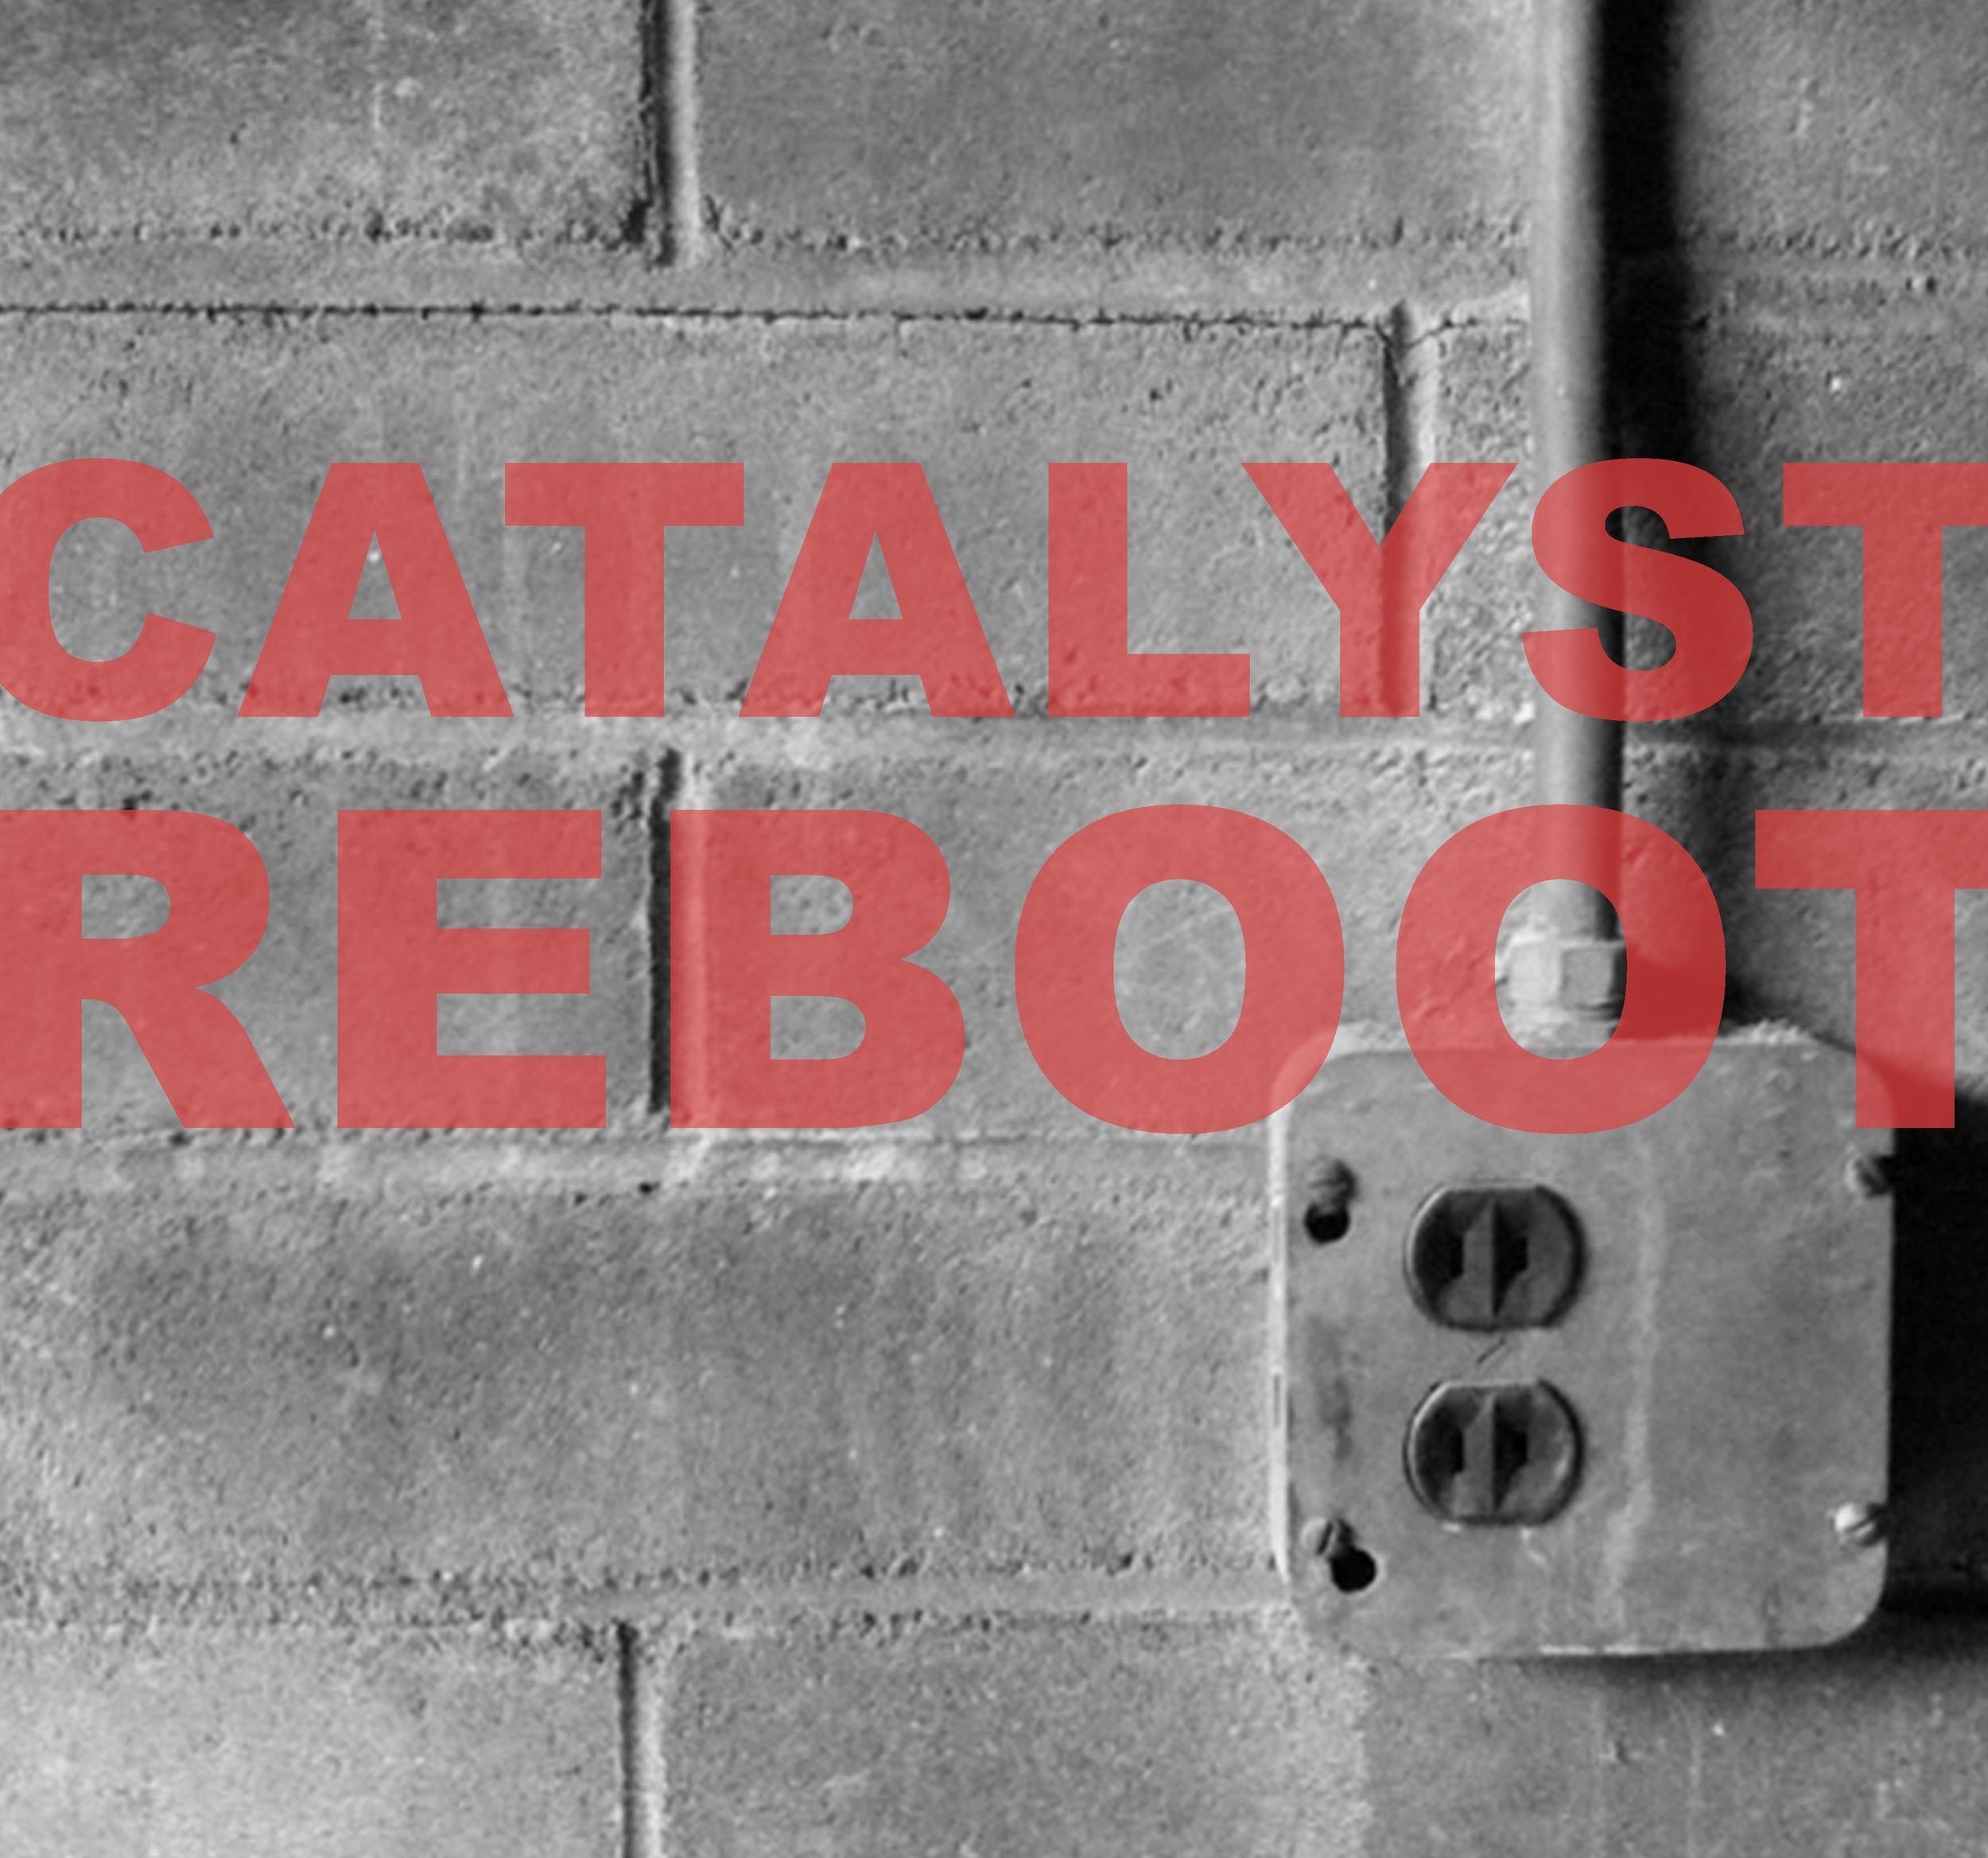 CATALYST REBOOT red.jpg